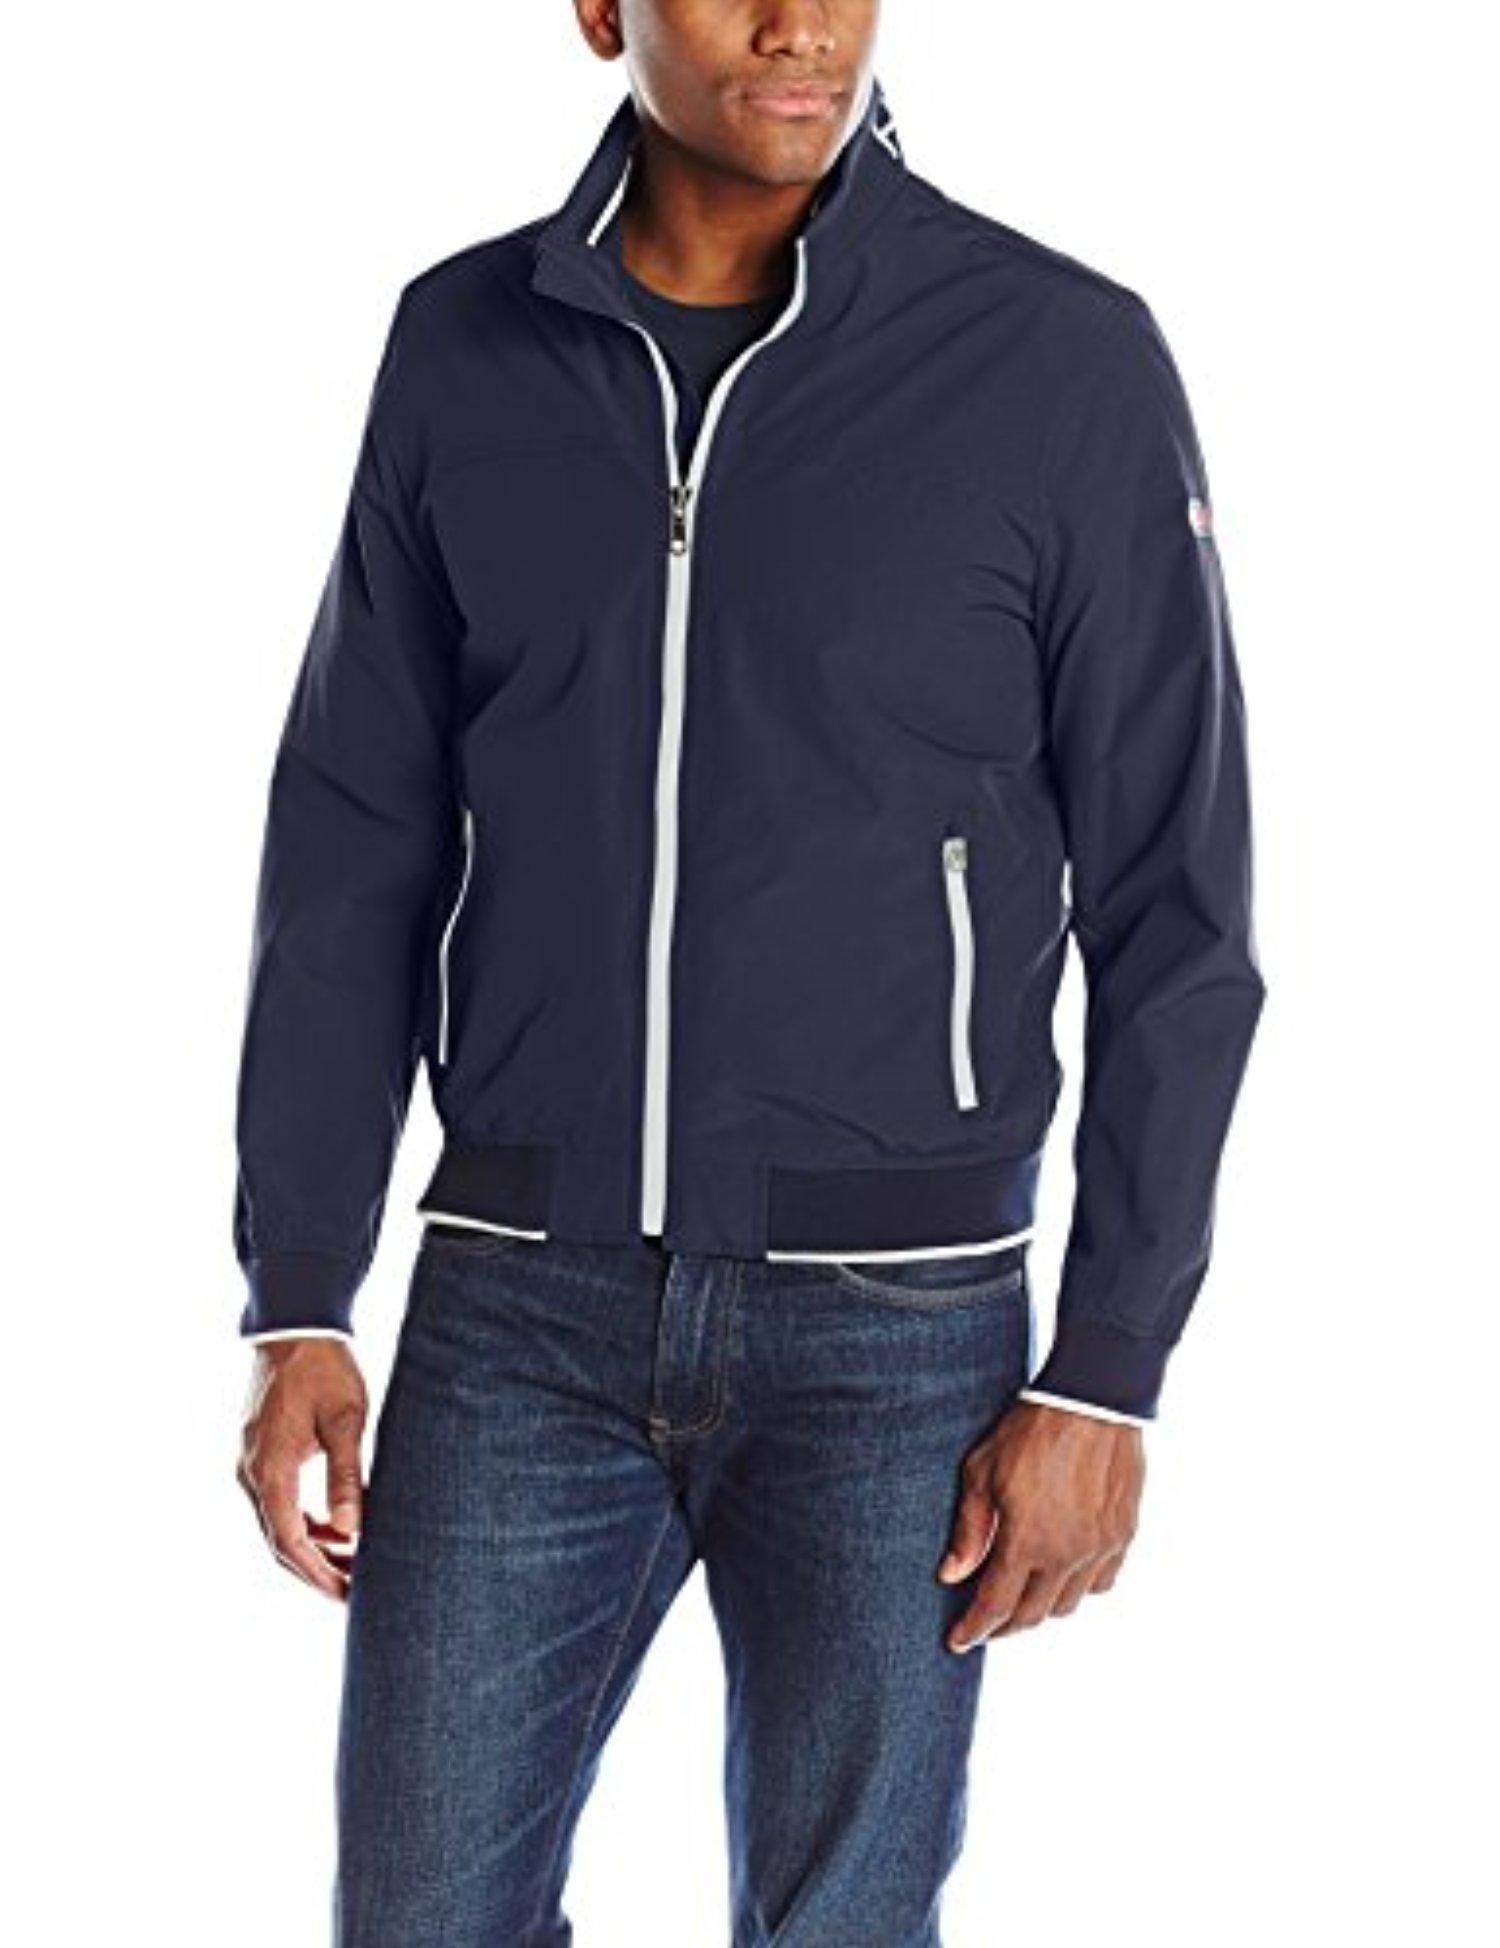 Tommy Hilfiger Zip Front Pockets Men S Yachting Bomber Jacket Navy Medium Jackets Mens Jackets Mens Clothing Styles [ 1948 x 1500 Pixel ]